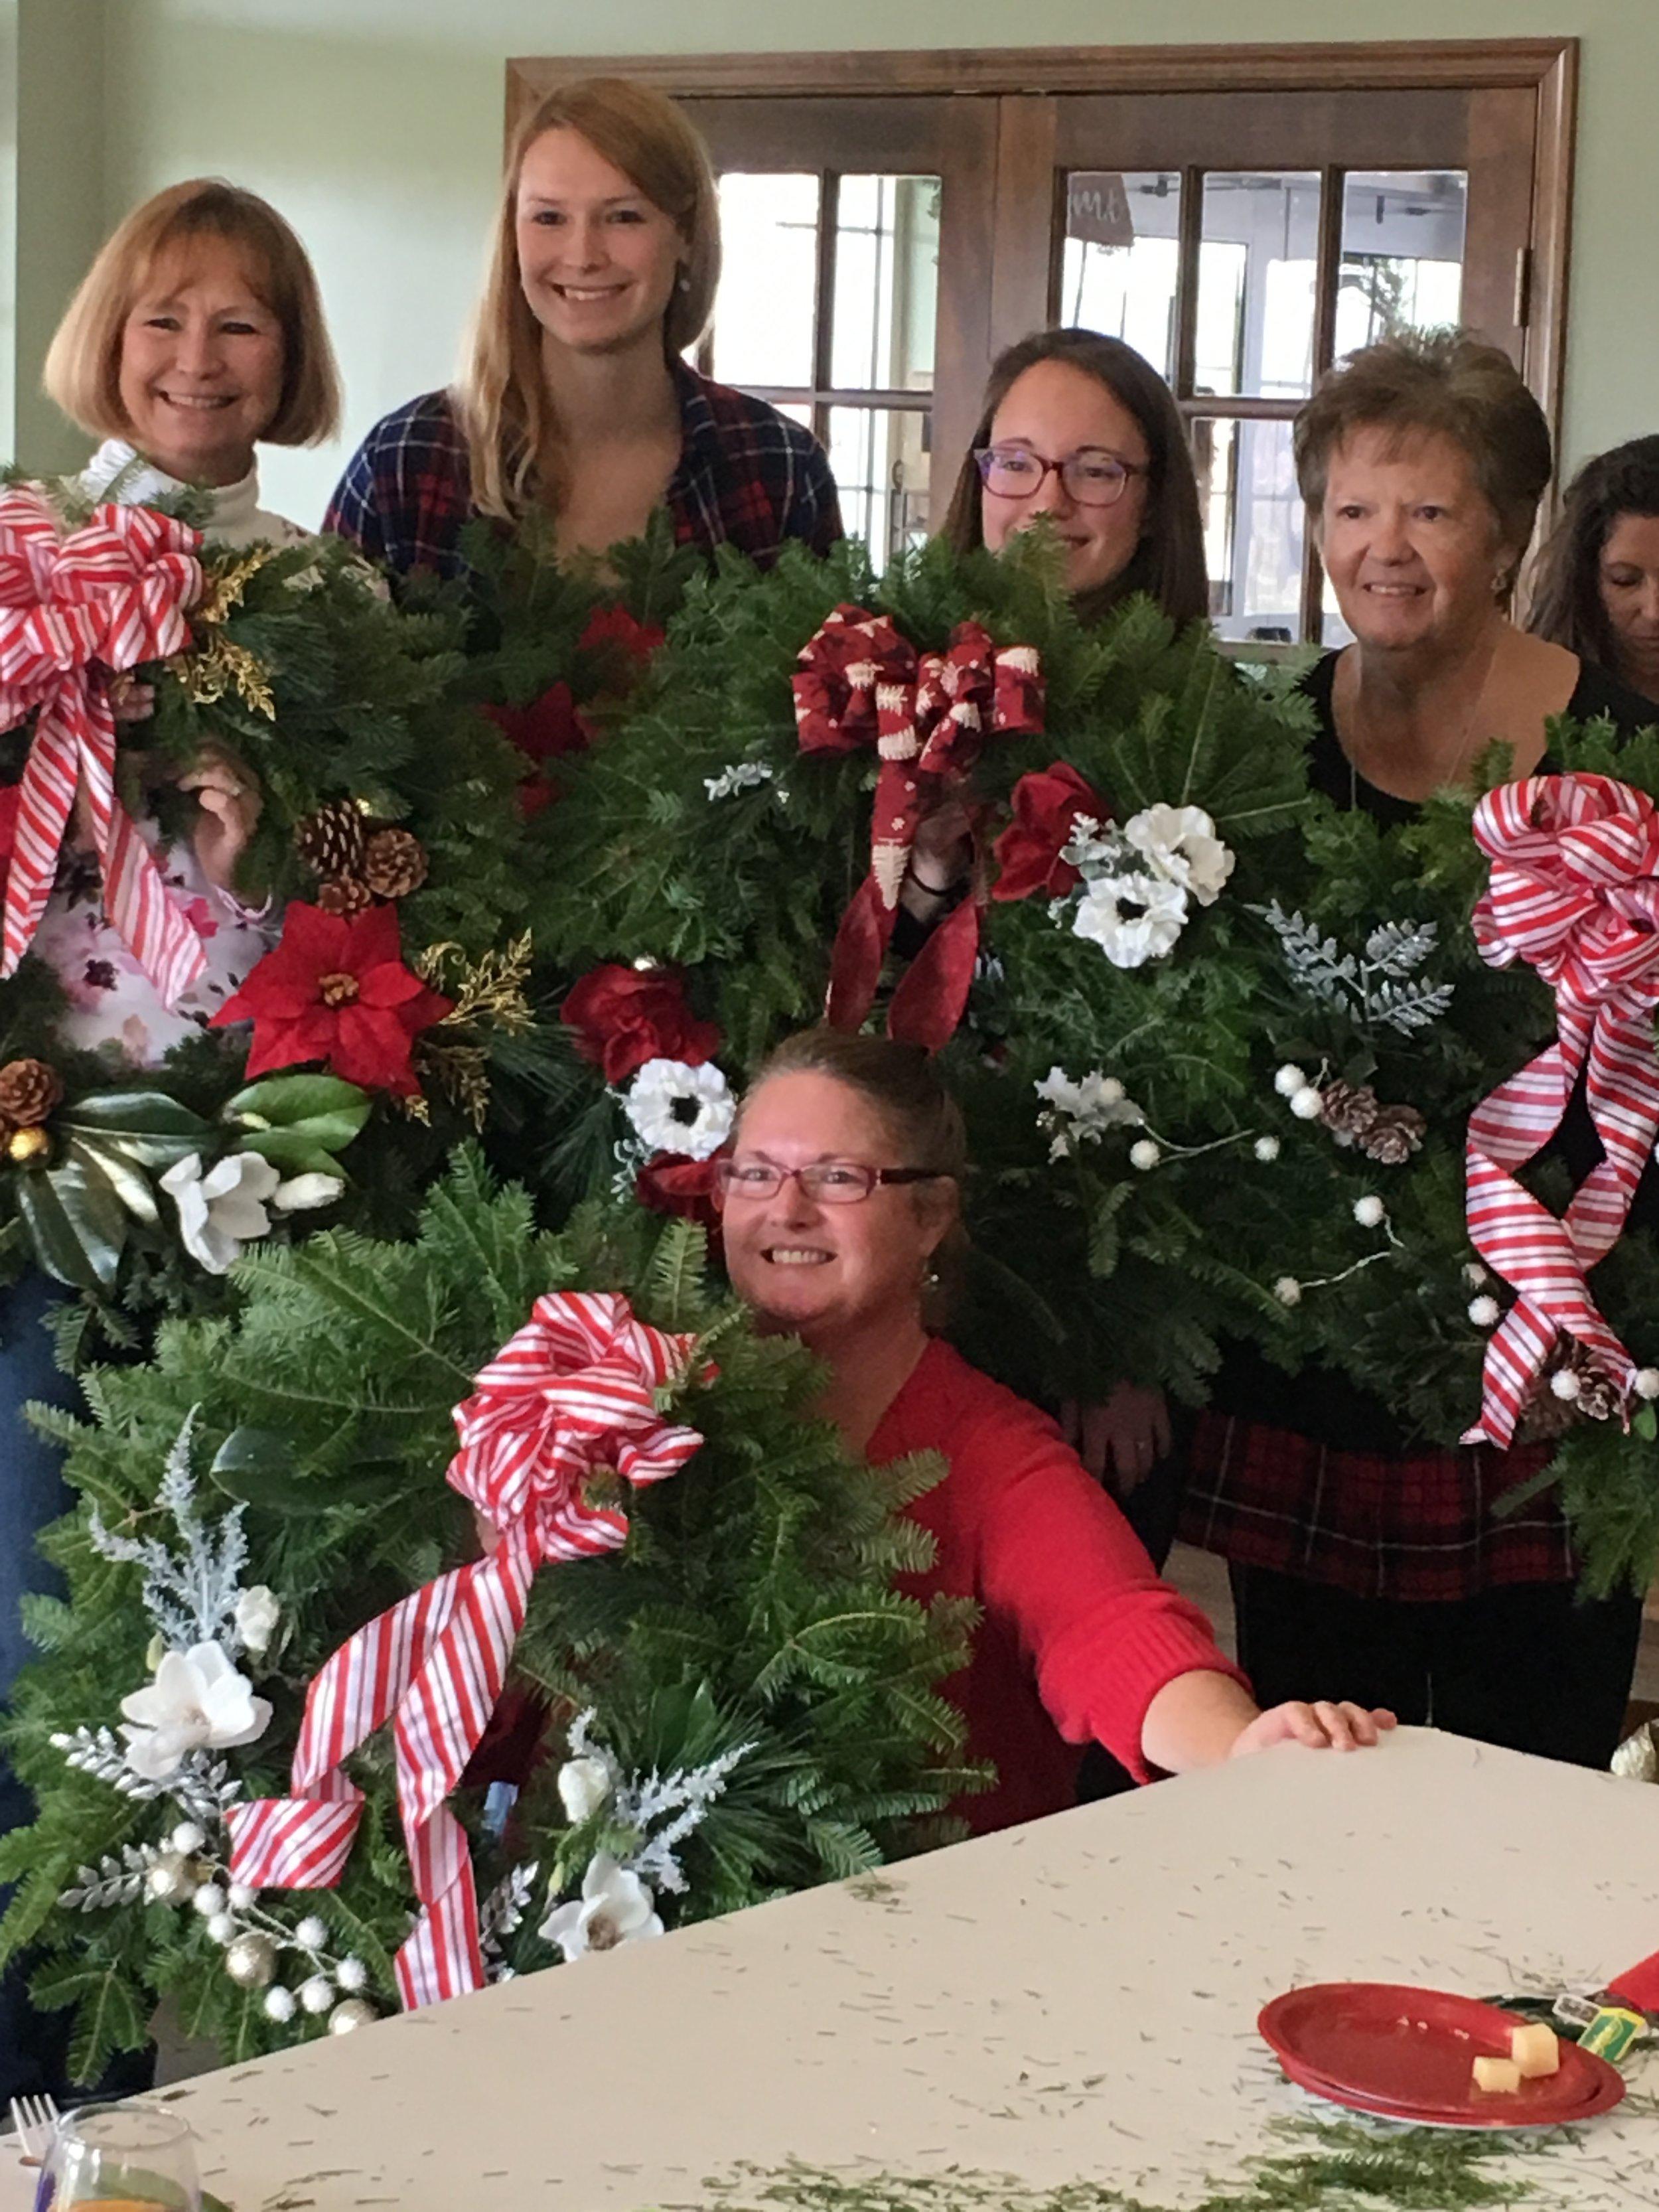 Dec. 2, 2017 Mistletoe & Mimosas at Layton's Chance